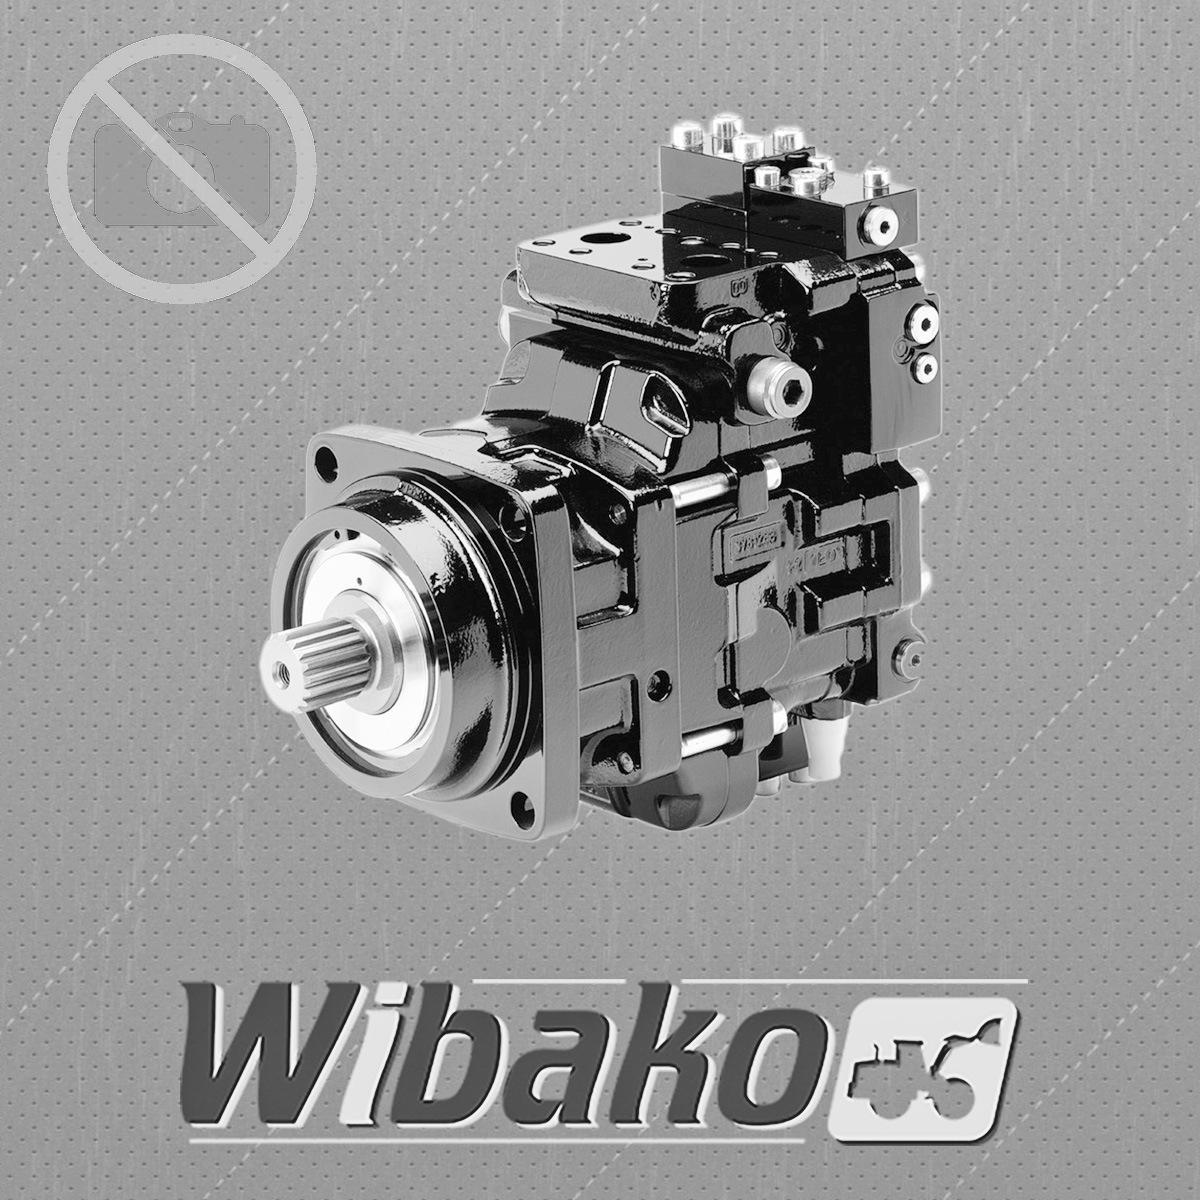 Main pump Kawasaki K3V112DT-1G4R-9C12-1 KRJ4573 - 5ds2d3 | WIBAKO